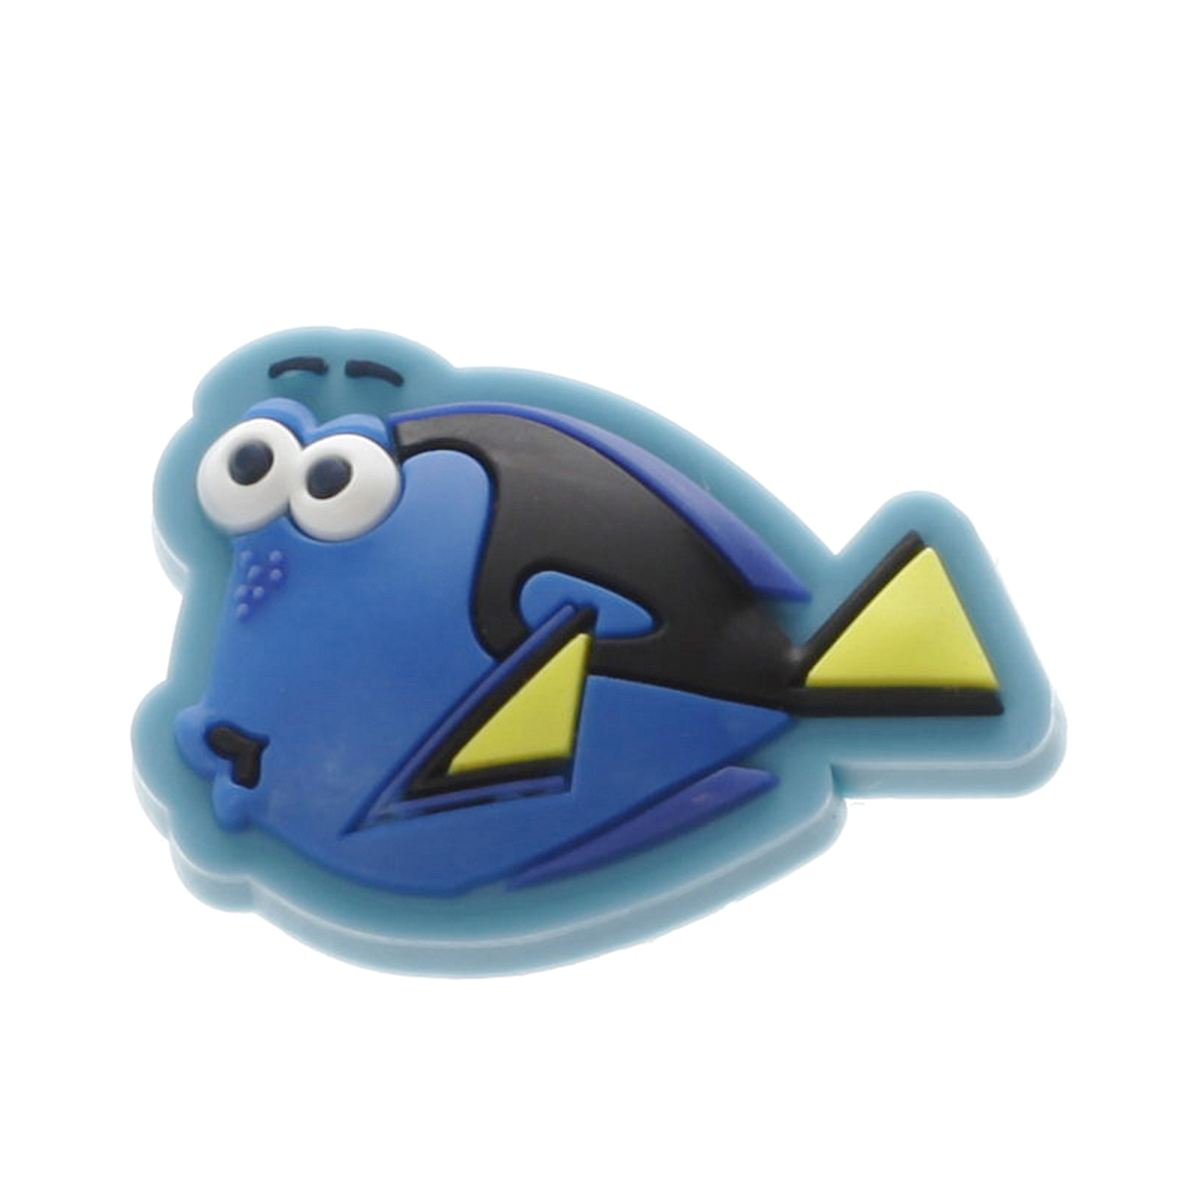 jibbitz Jibbitz Blue Dory Single Shoe Accessories